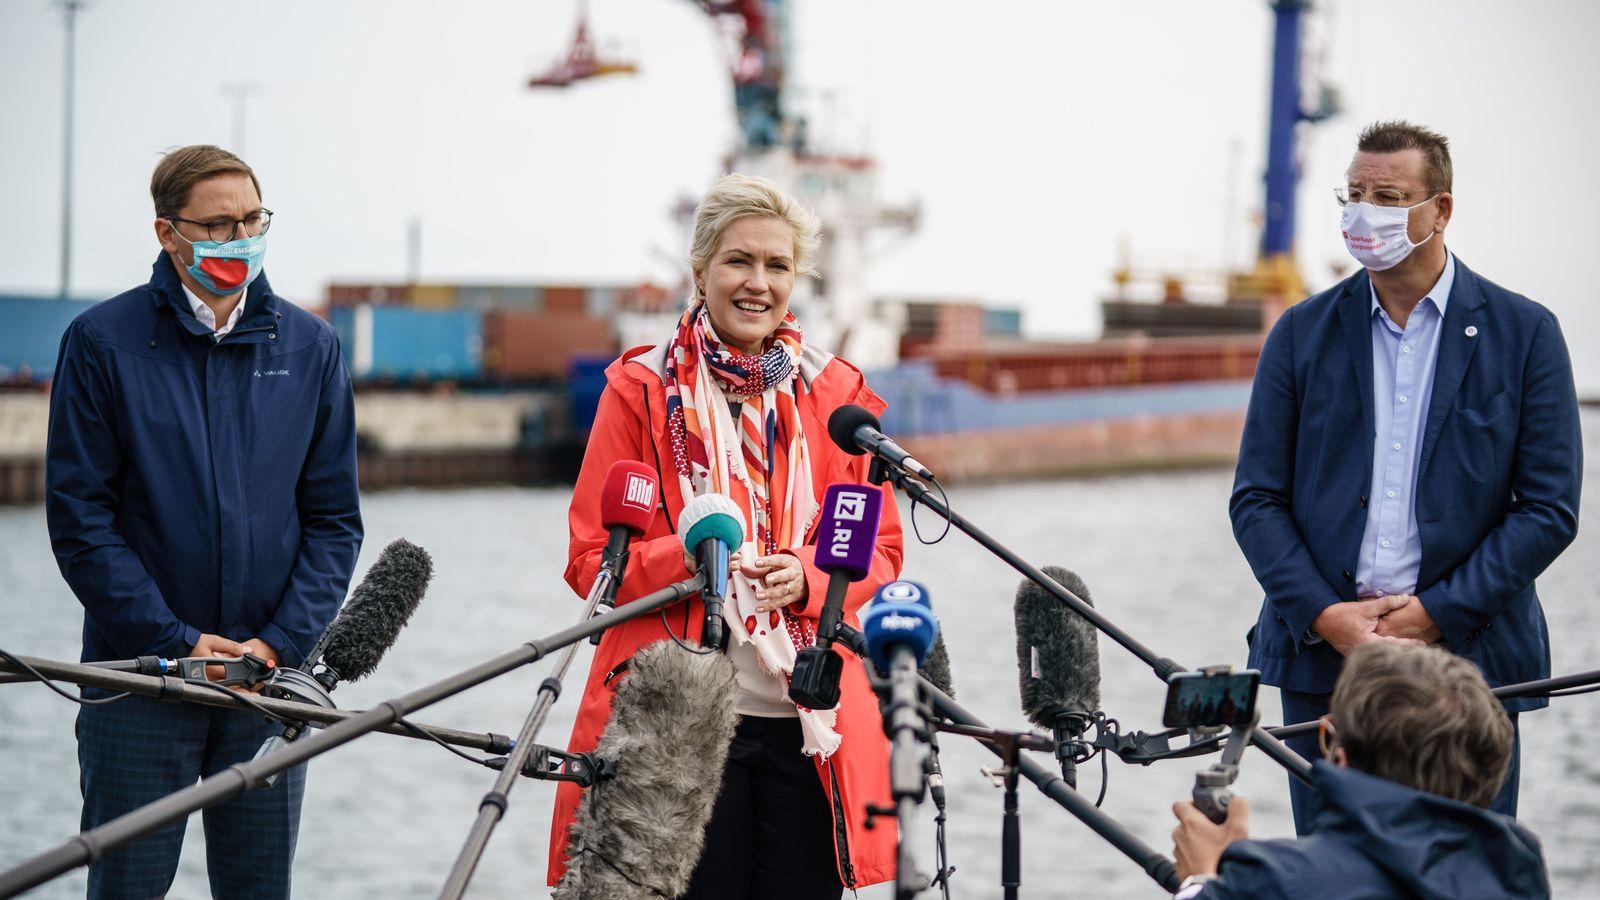 Mecklenburg-Western Pomerania State Premier Manuela Schwesig gives statement on Nord Stream 2 project, Sassnitz, Germany - 11 Sep 2020